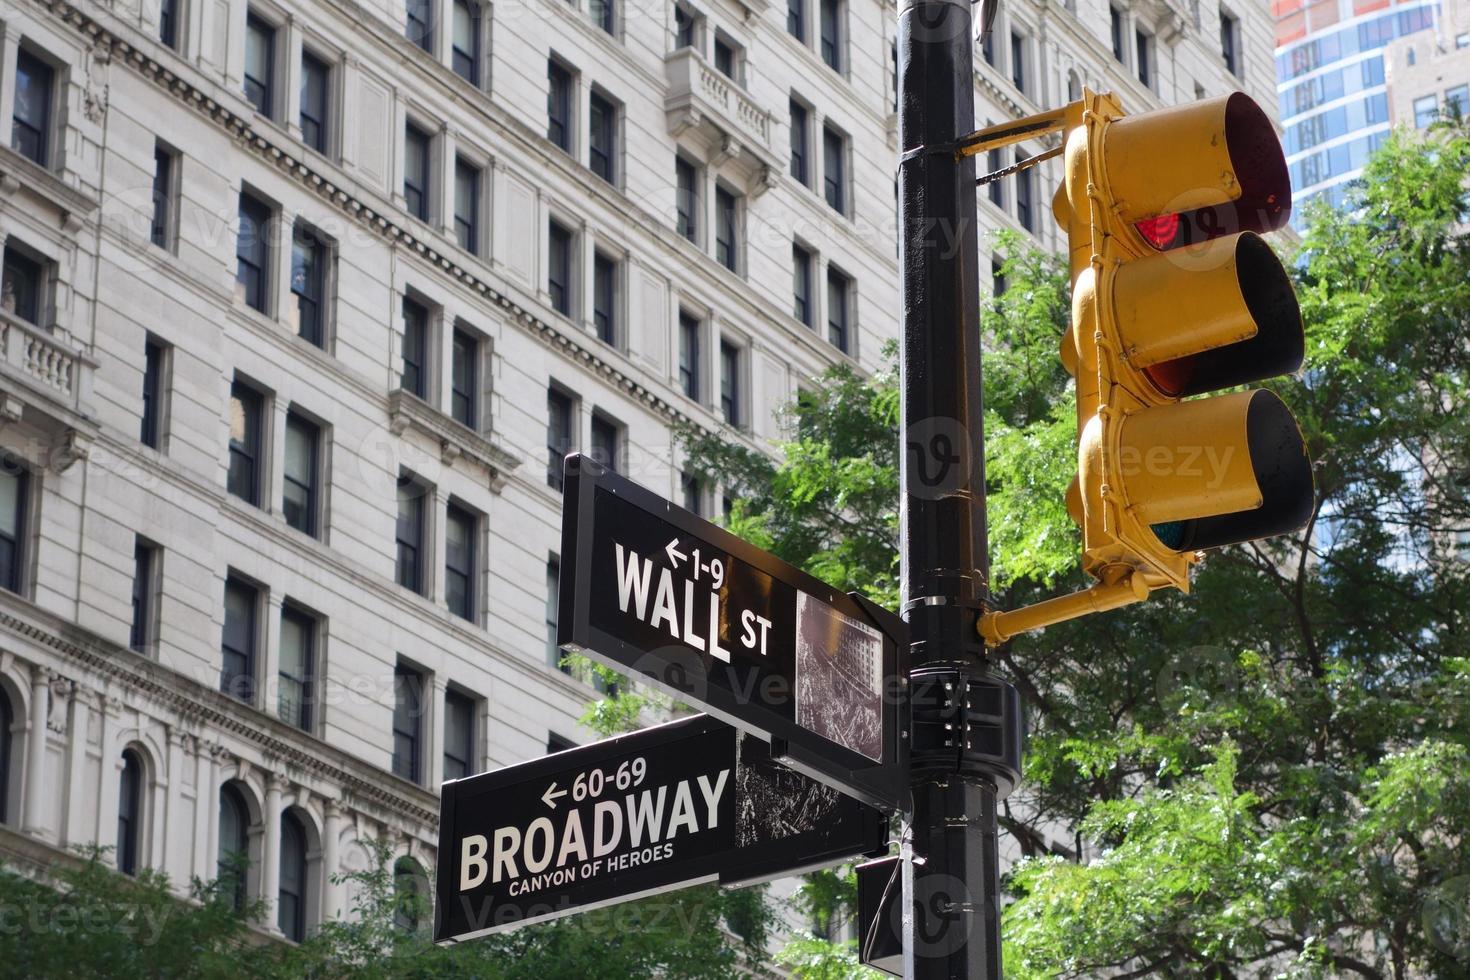 Crossing Wall Street / Broadway à Manhattan, New York photo